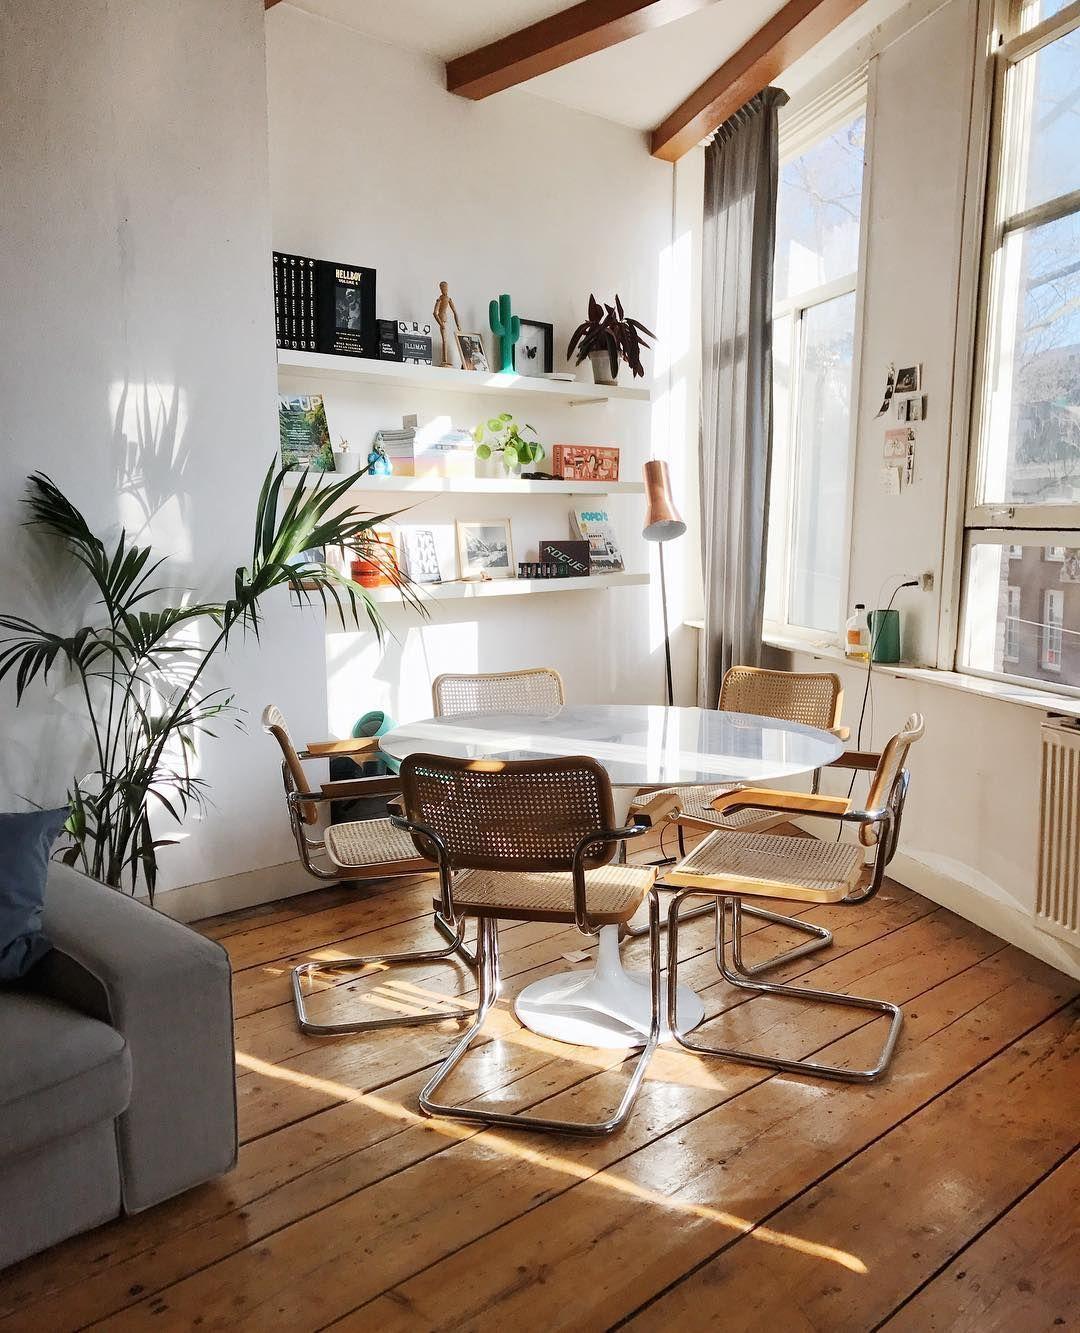 21 Best Dining Room Lighting Ideas For 21 ...